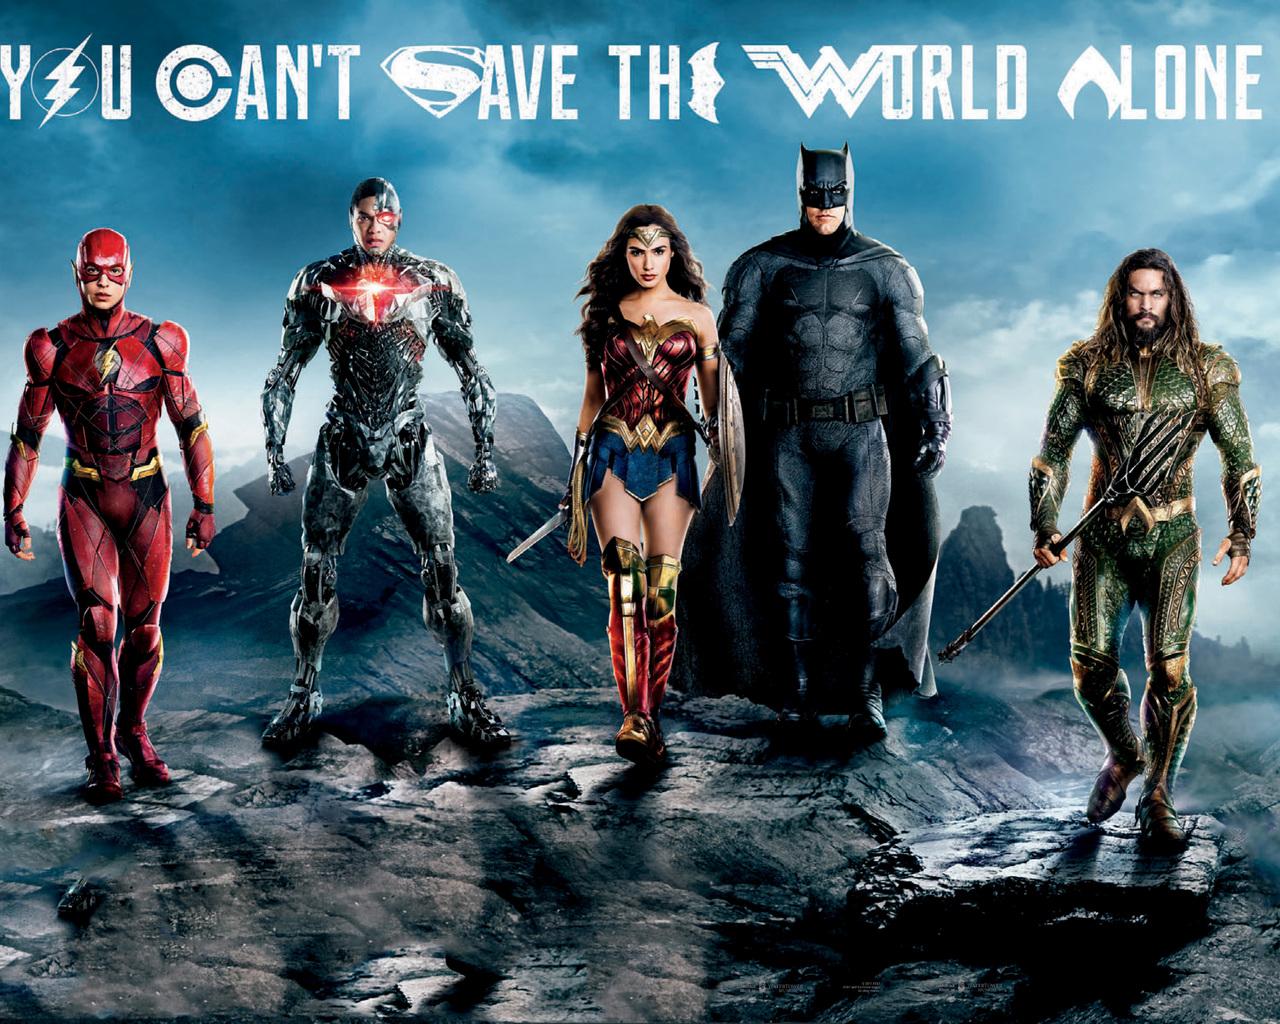 1280x1024 Wonder Woman Movie 1280x1024 Resolution Hd 4k: 1280x1024 Justice League Flash Cyborg Wonder Woman Batman